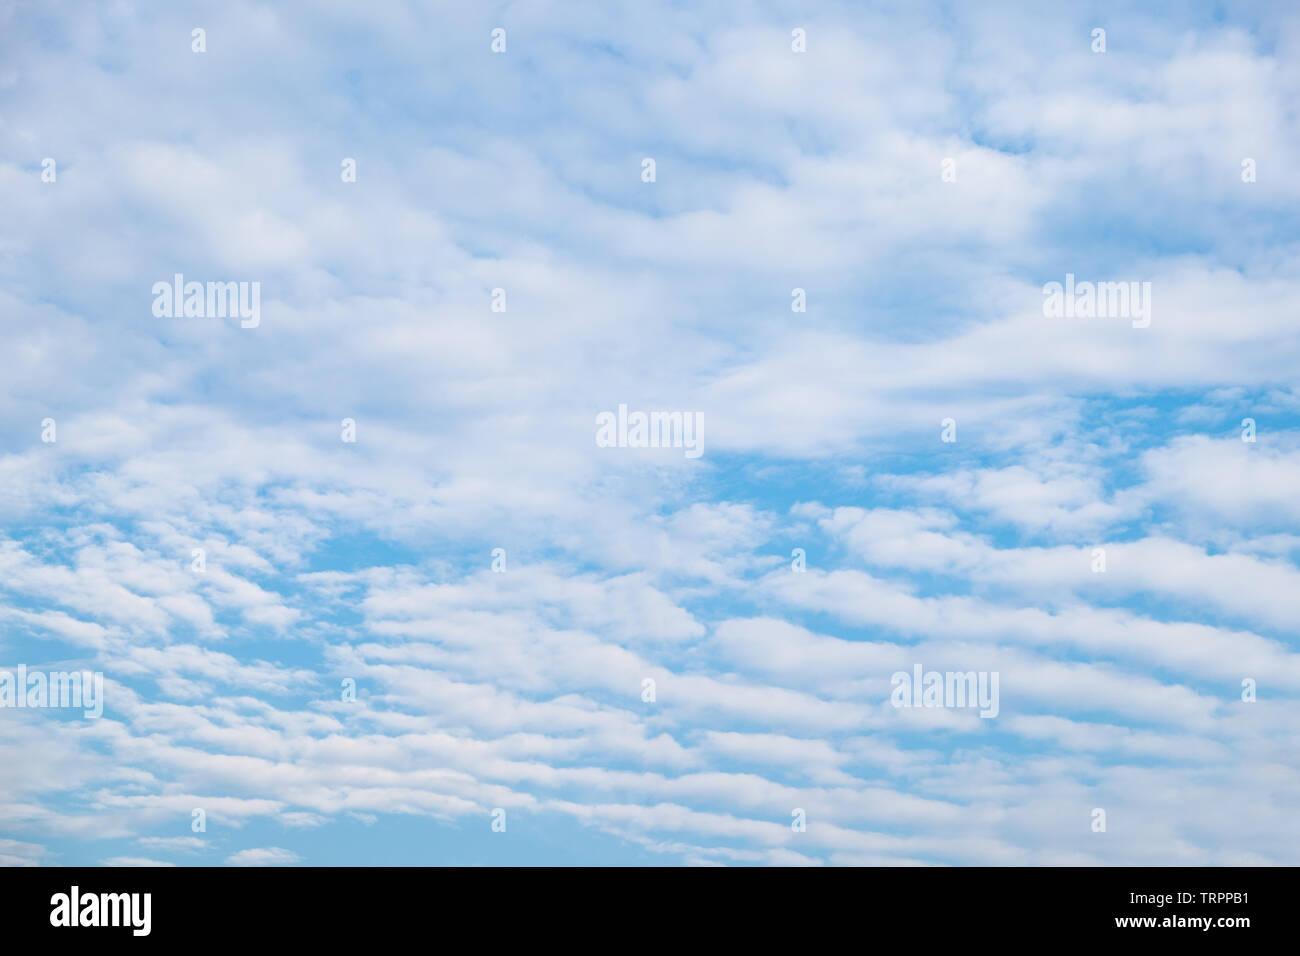 Cloud wave furrow streaky in blue sky - Stock Image